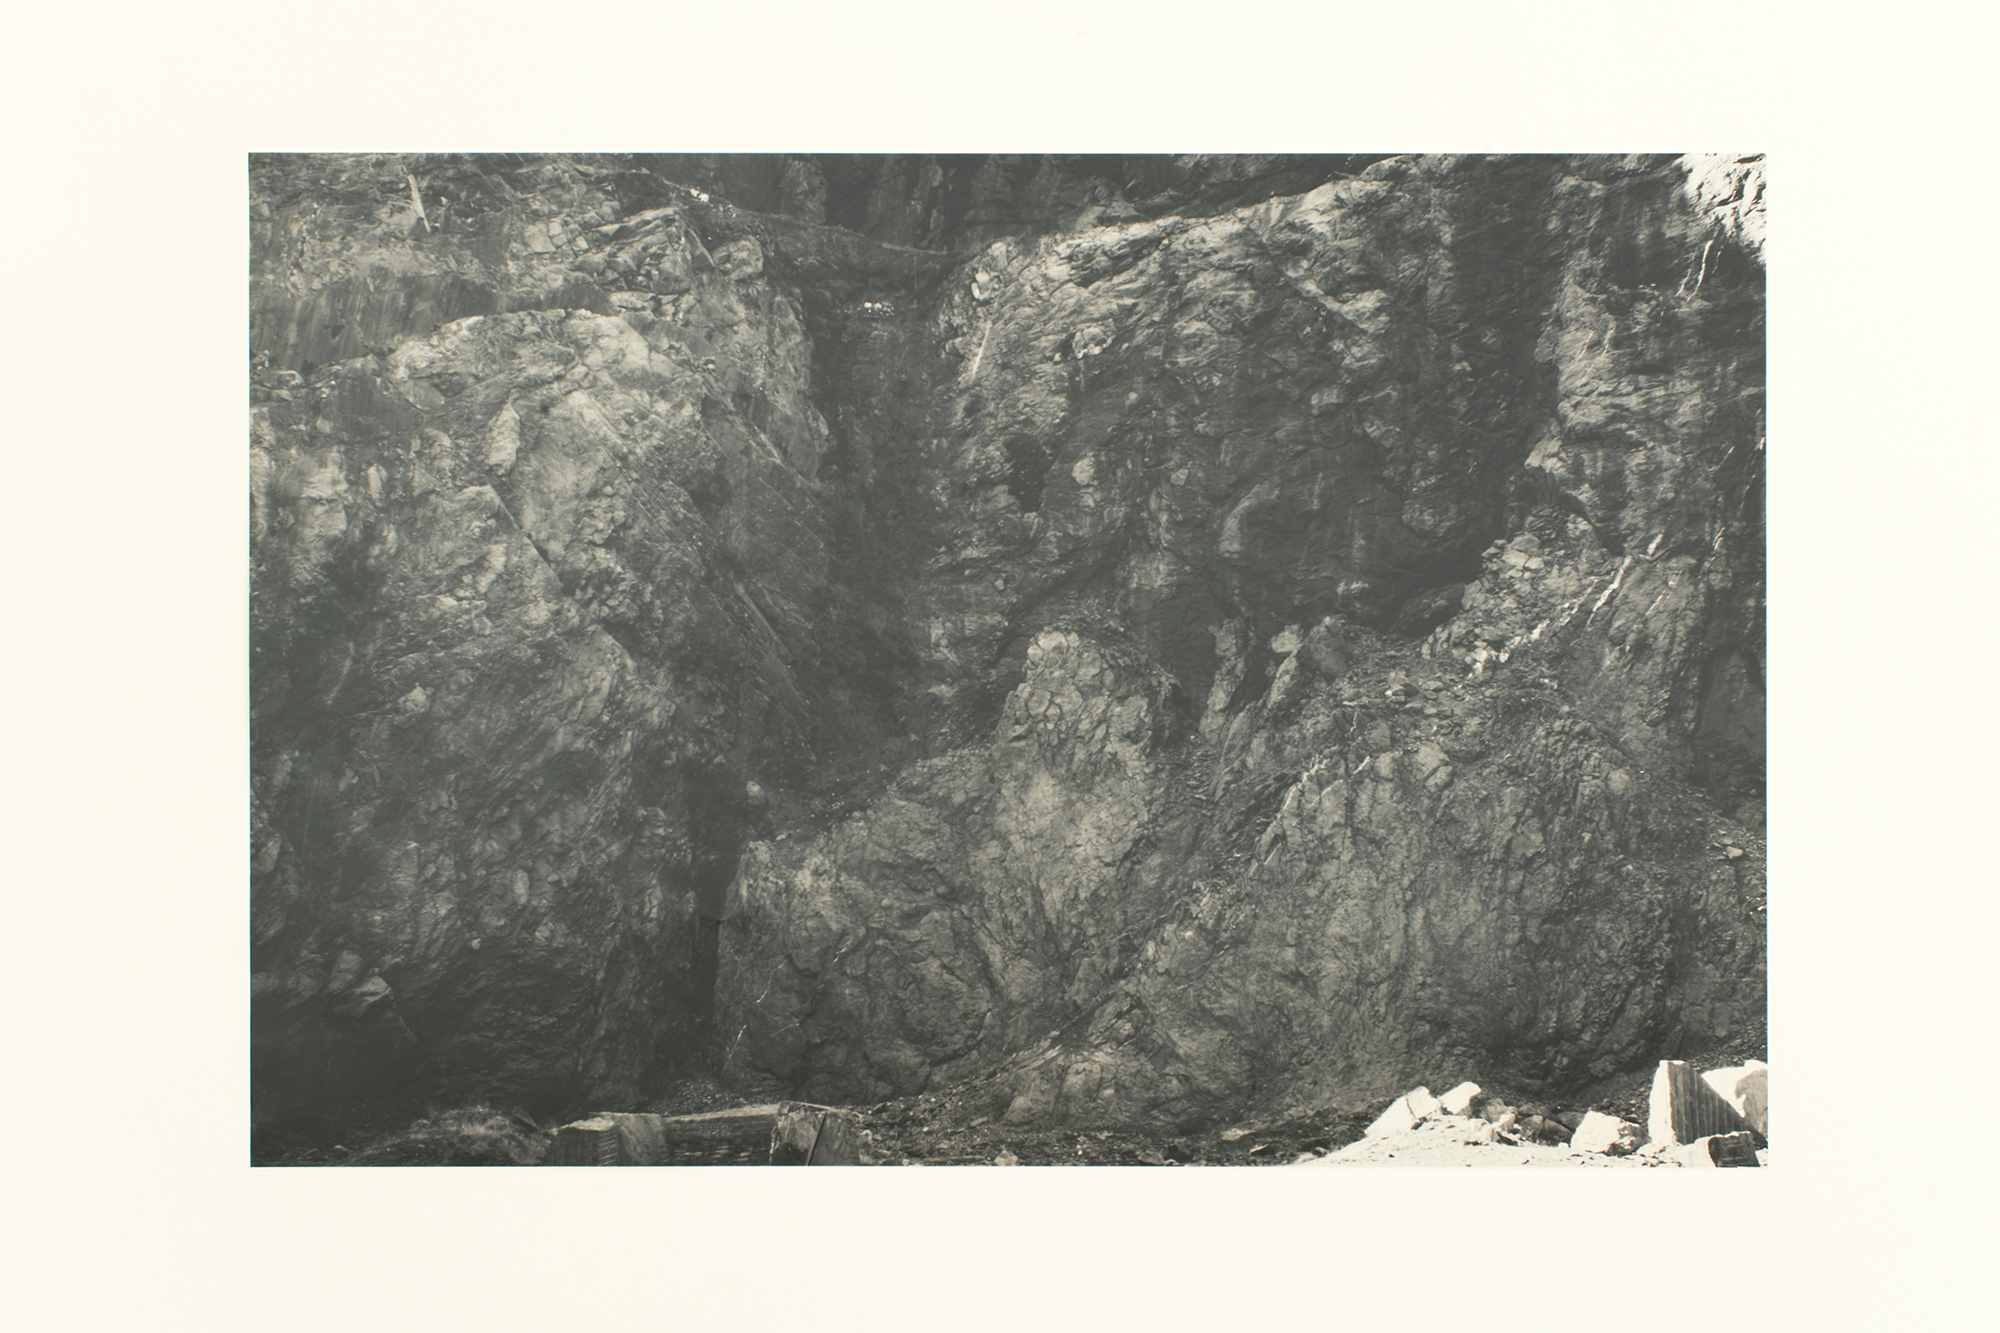 Eco-Intervalo-Obstáculo-Resonancia-Reflexión